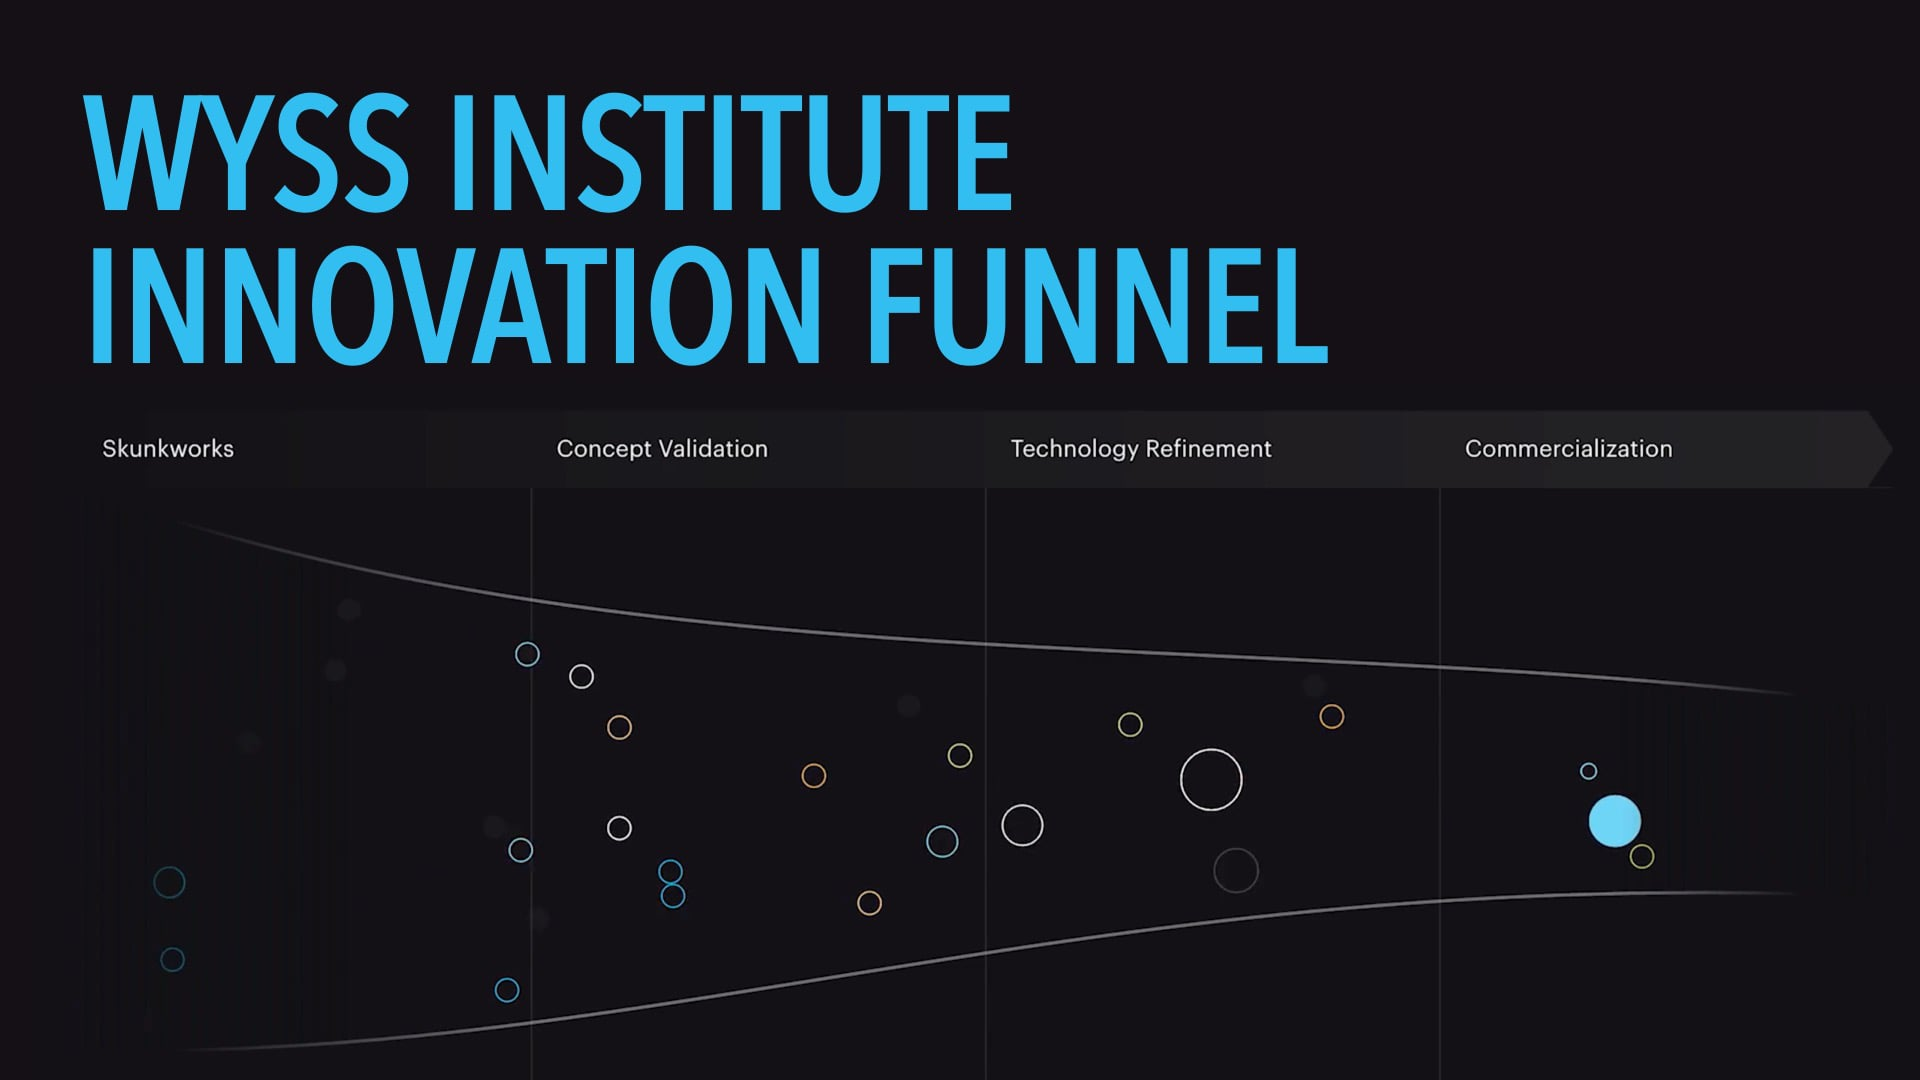 Wyss Institute Innovation Funnel